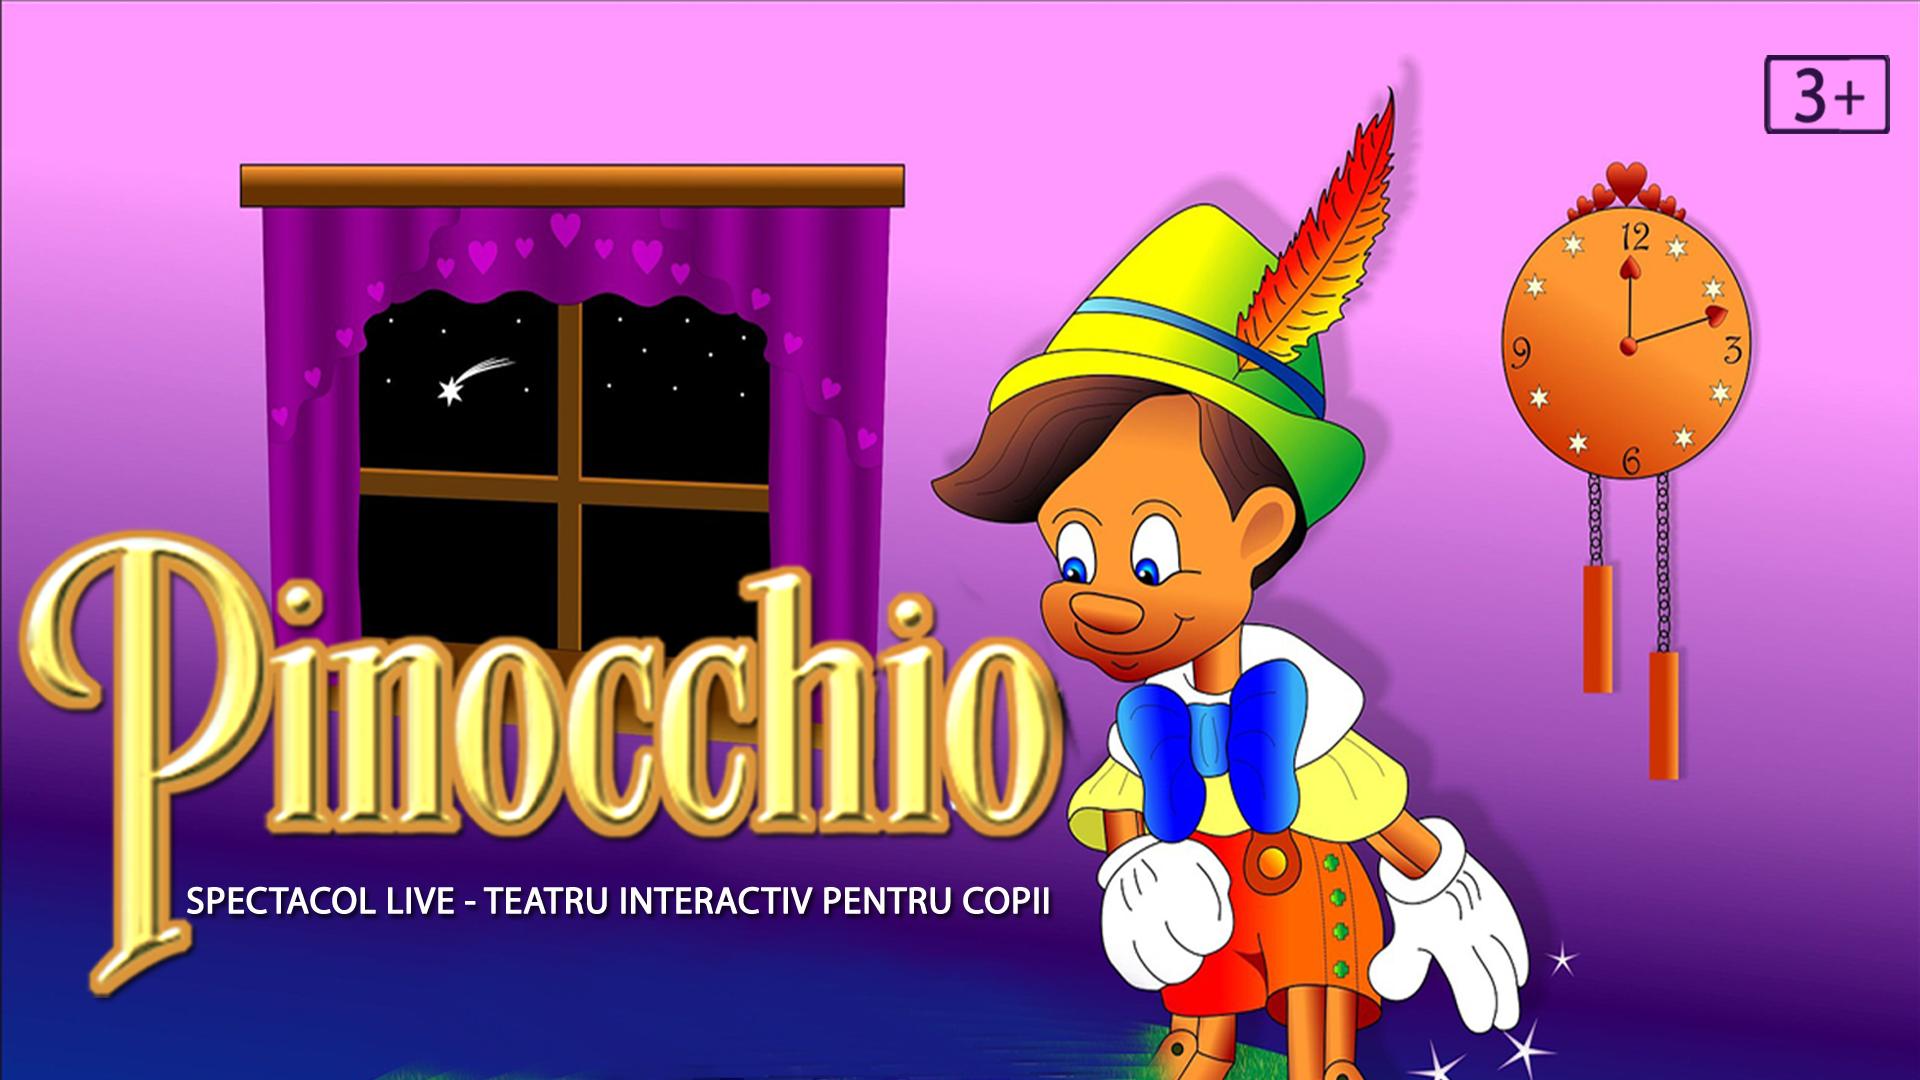 cover_event_Pinocchio_1920x1080_FB